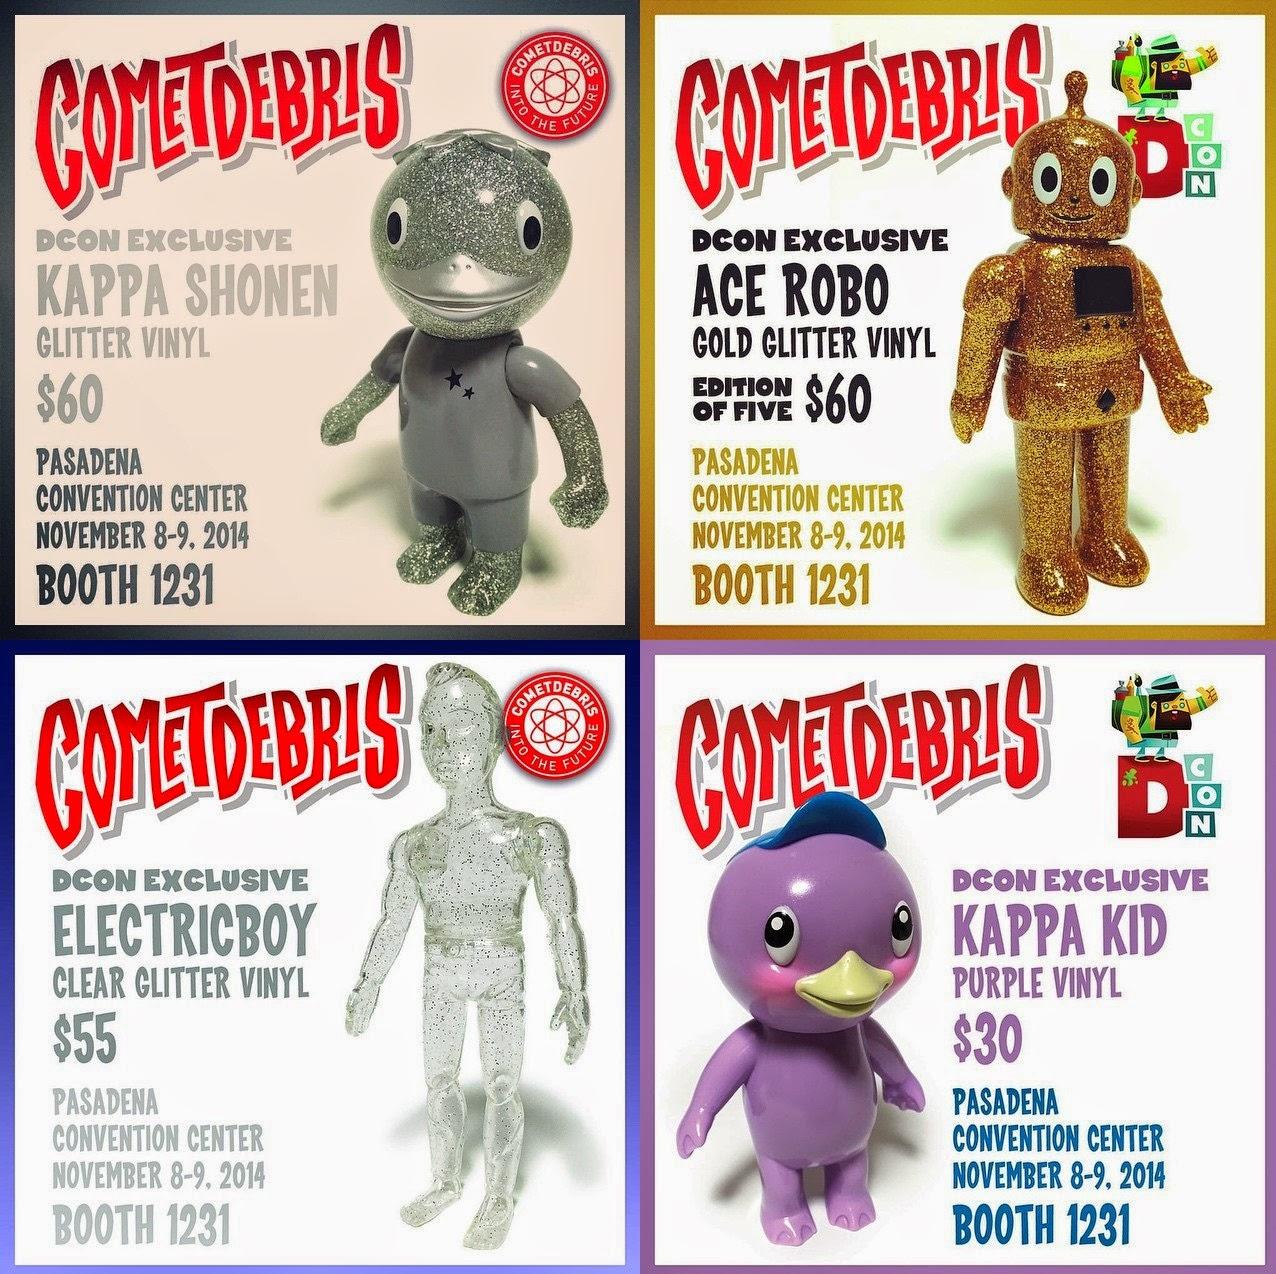 Designer Con 2014 Exclusive Glitter Kappa Shonen, Gold Glitter Ace Robo, Clear Glitter Electricboy & Purple Kappa Kid Vinyl Figures by Cometdebris